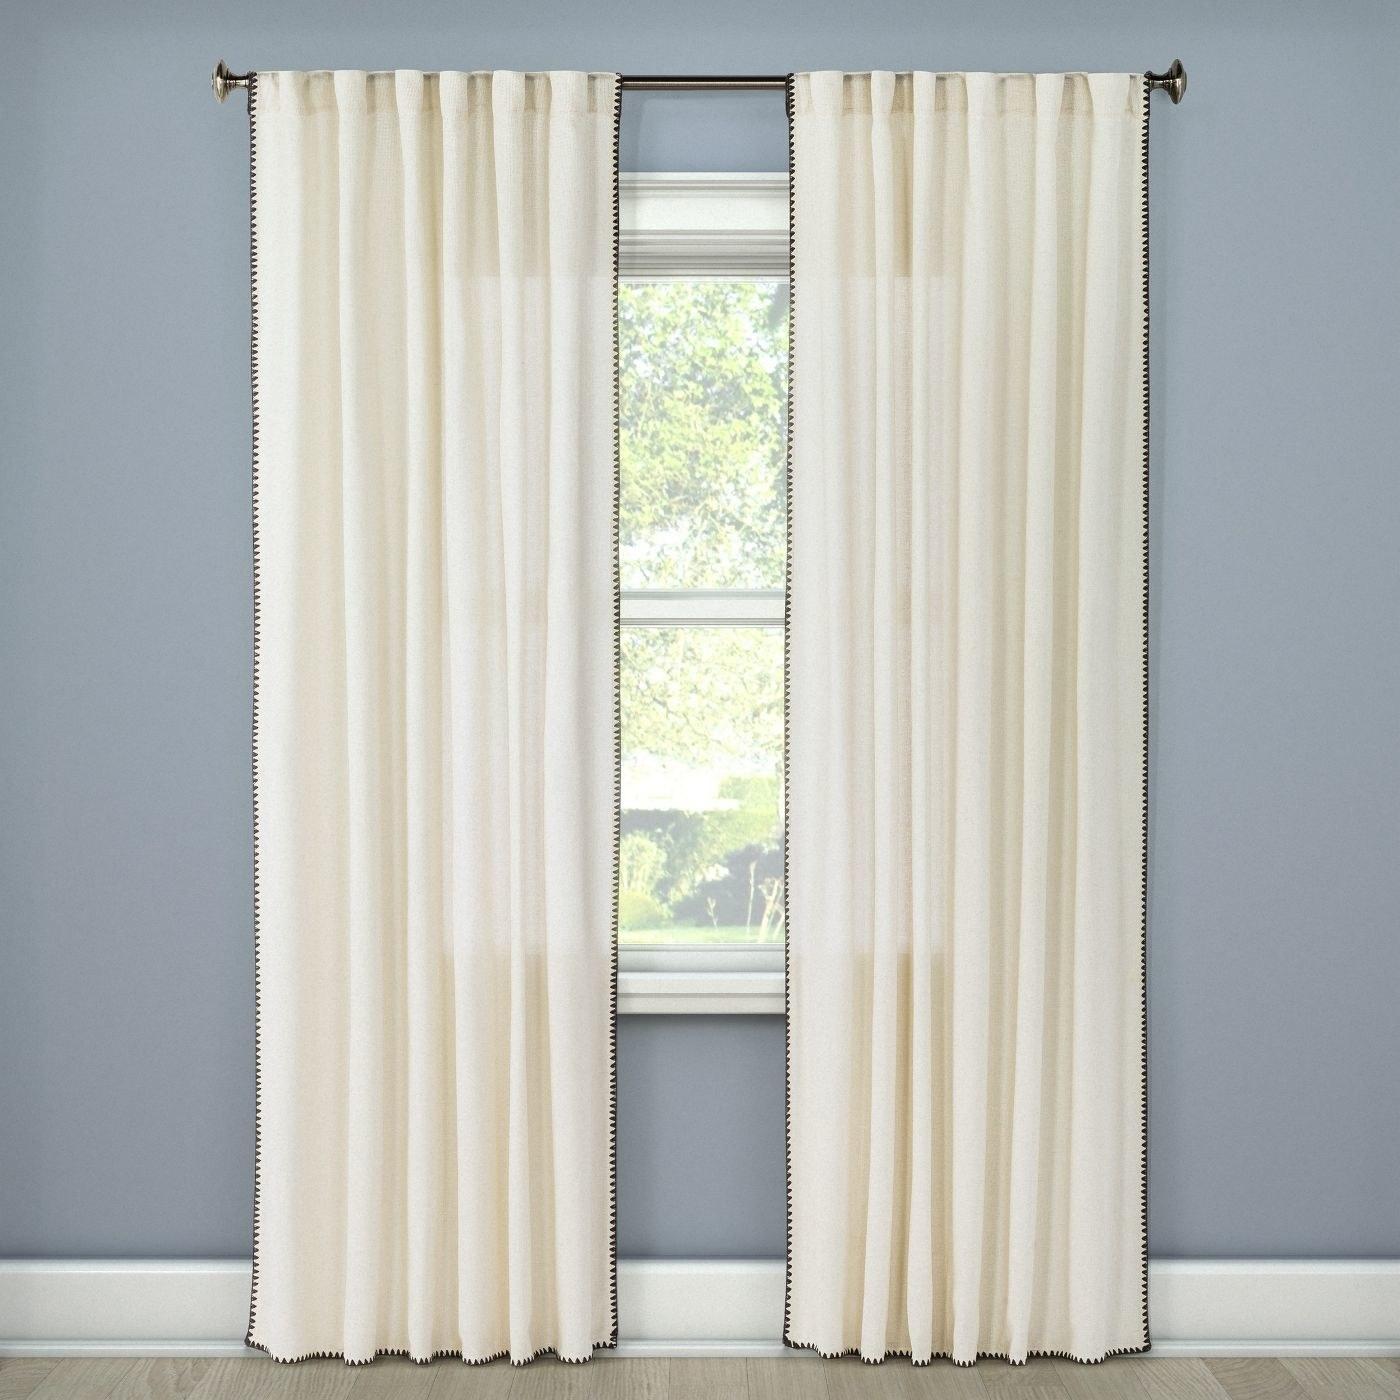 A white curtain in a home